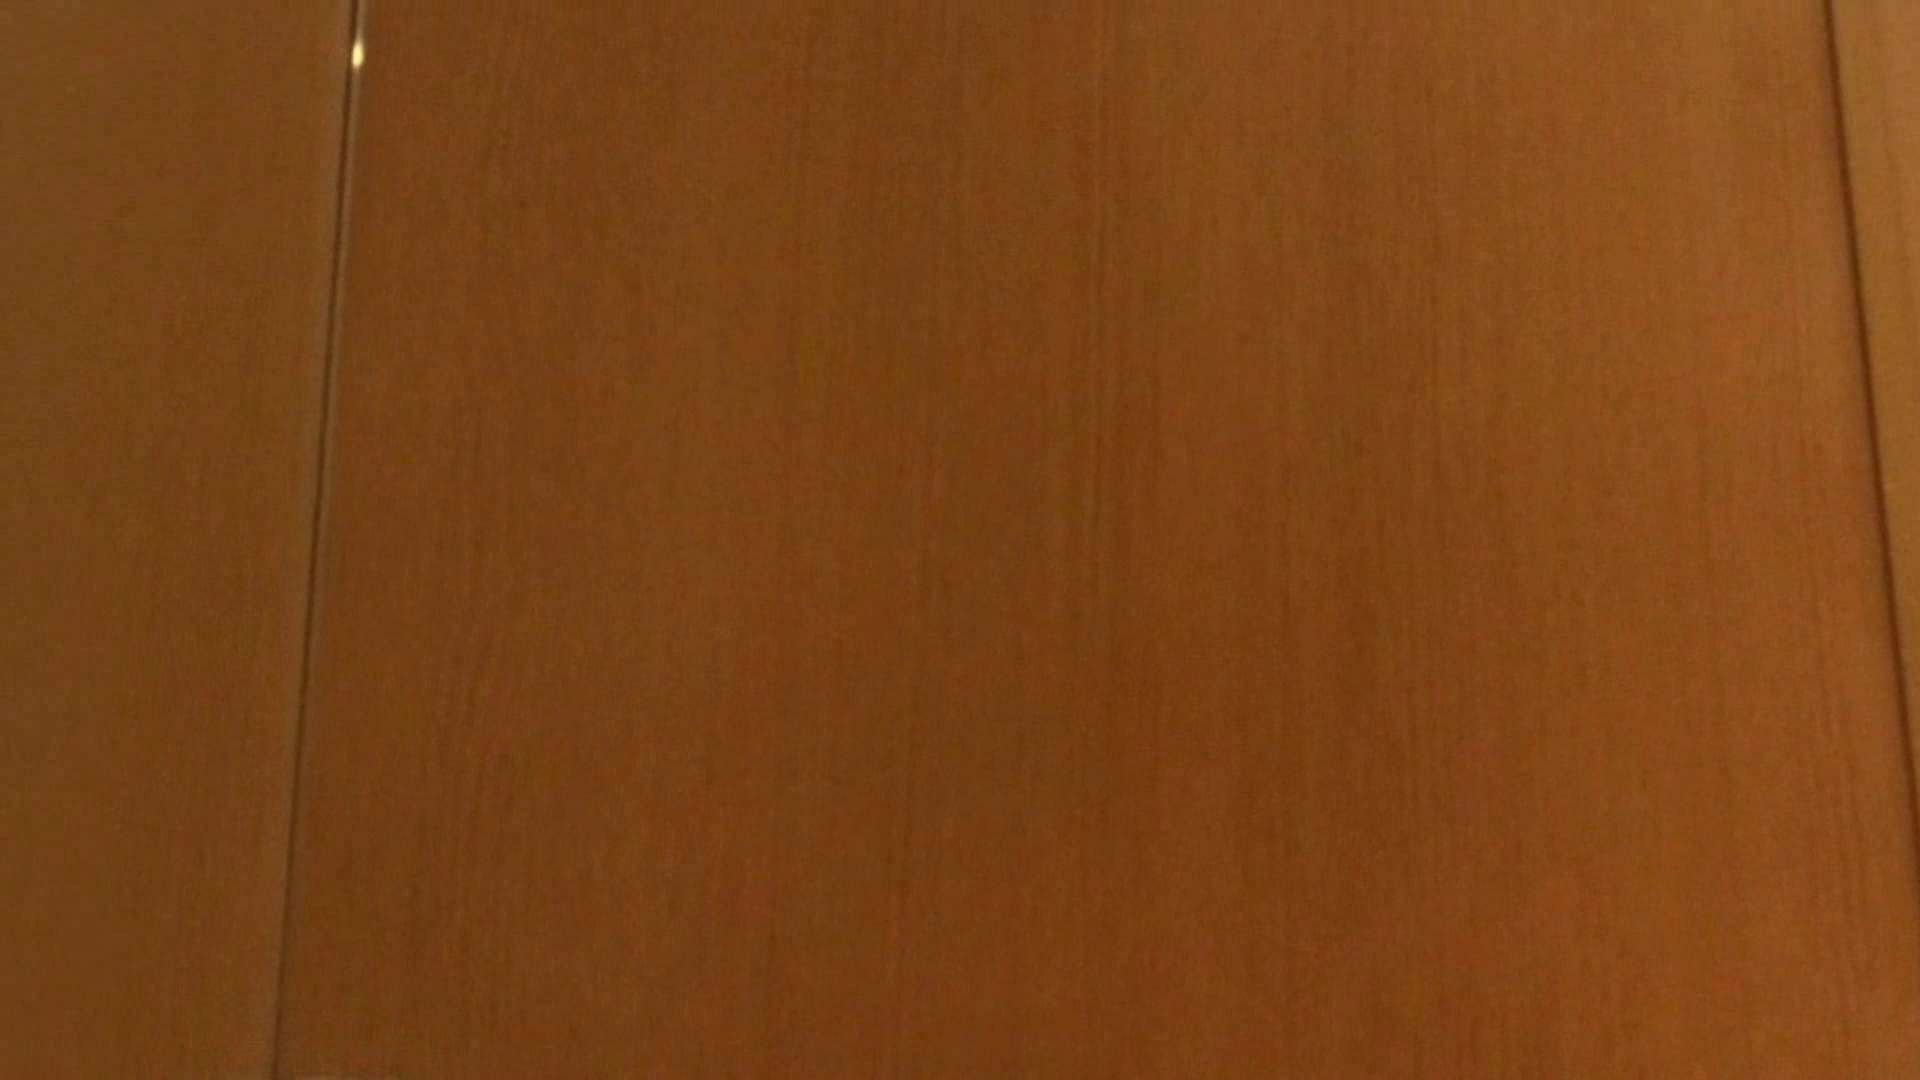 「噂」の国の厠観察日記2 Vol.08 厠  80連発 57